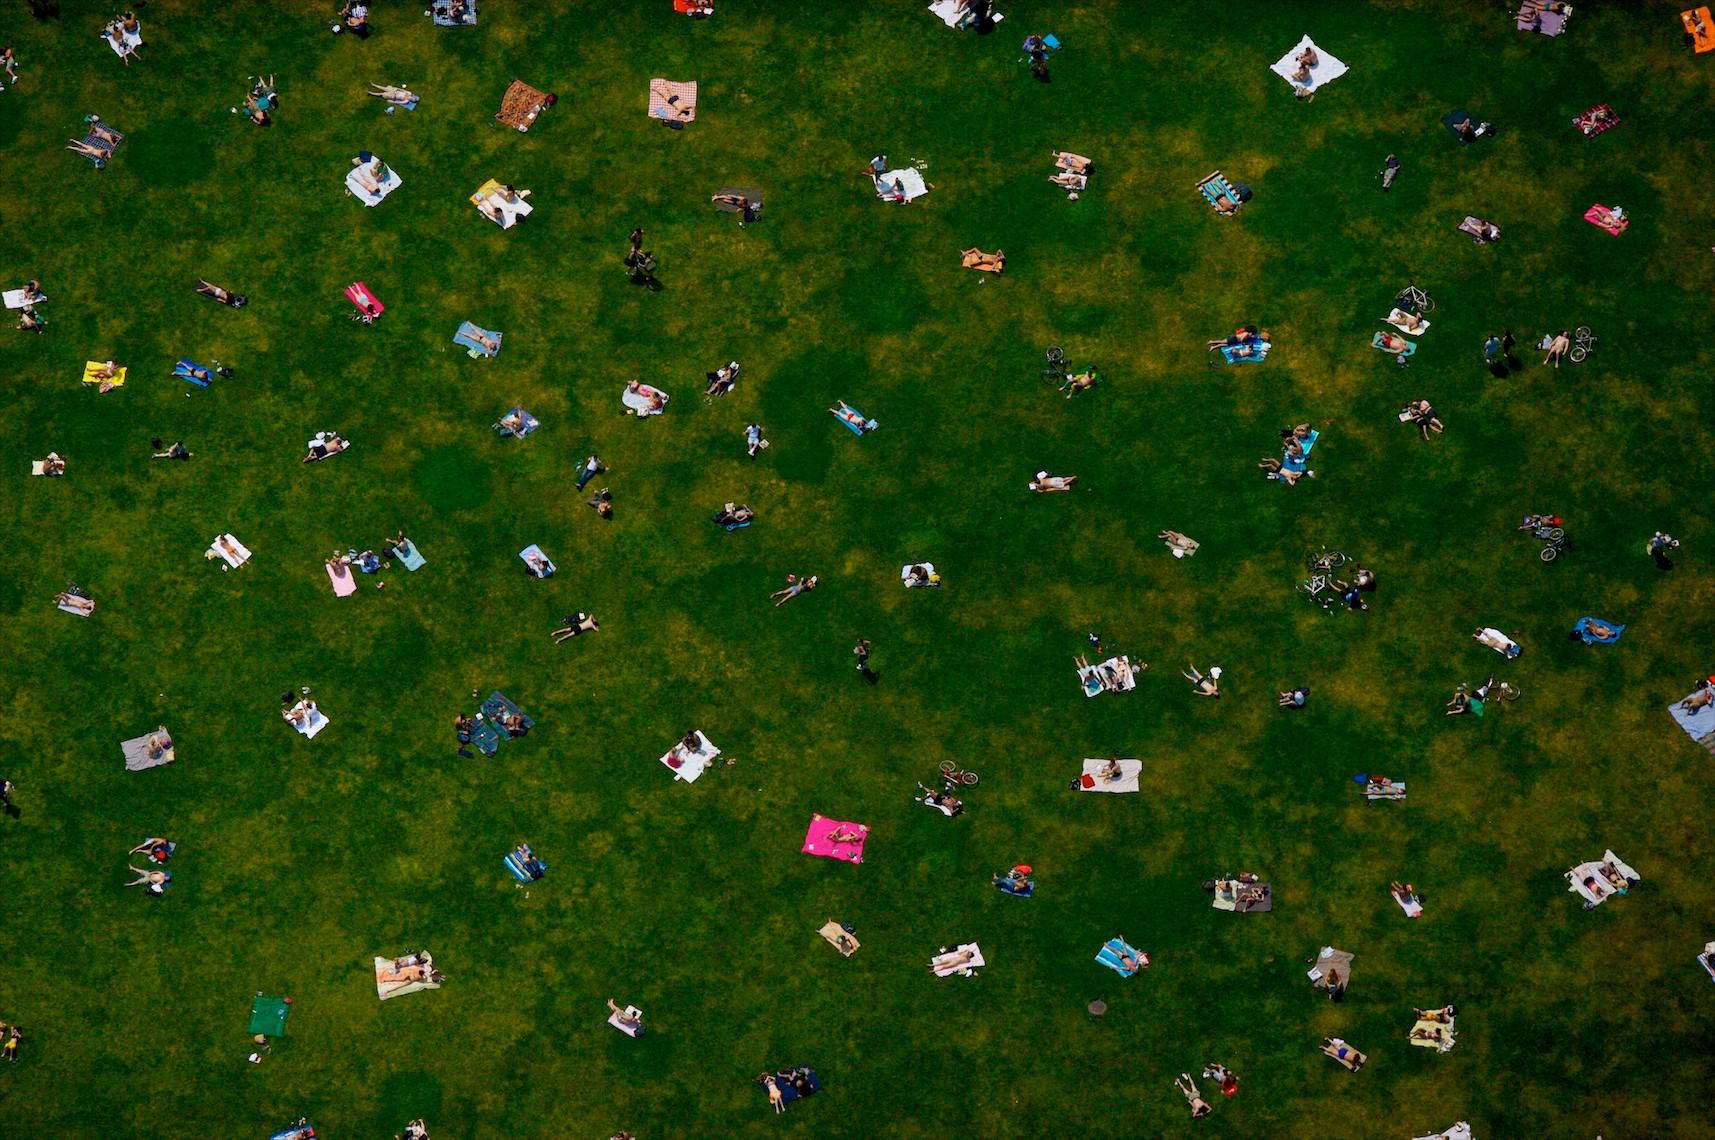 Bryant Park, New York City (Laforet Bryant Park Aerial 01)